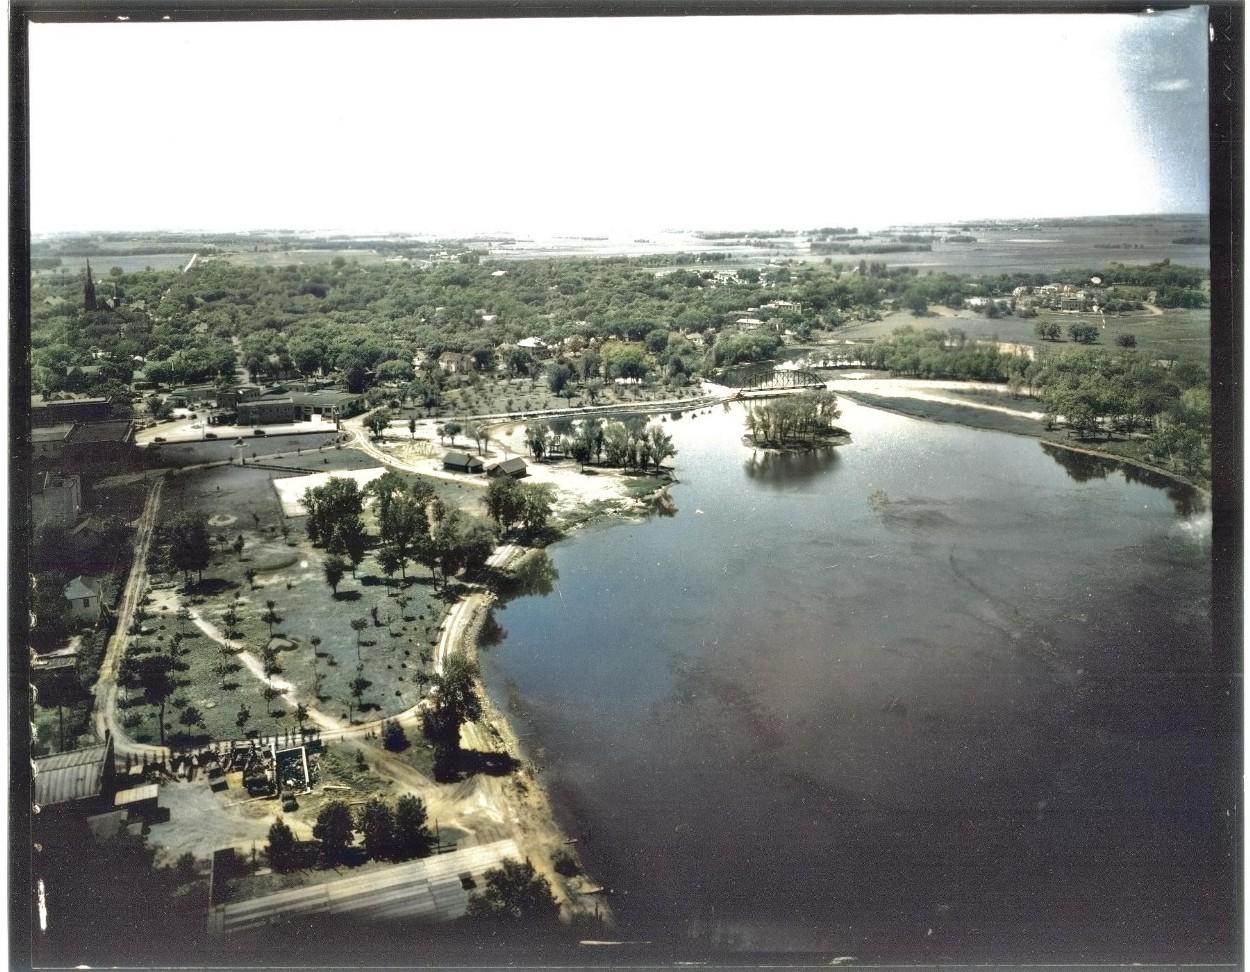 millpond-1920s